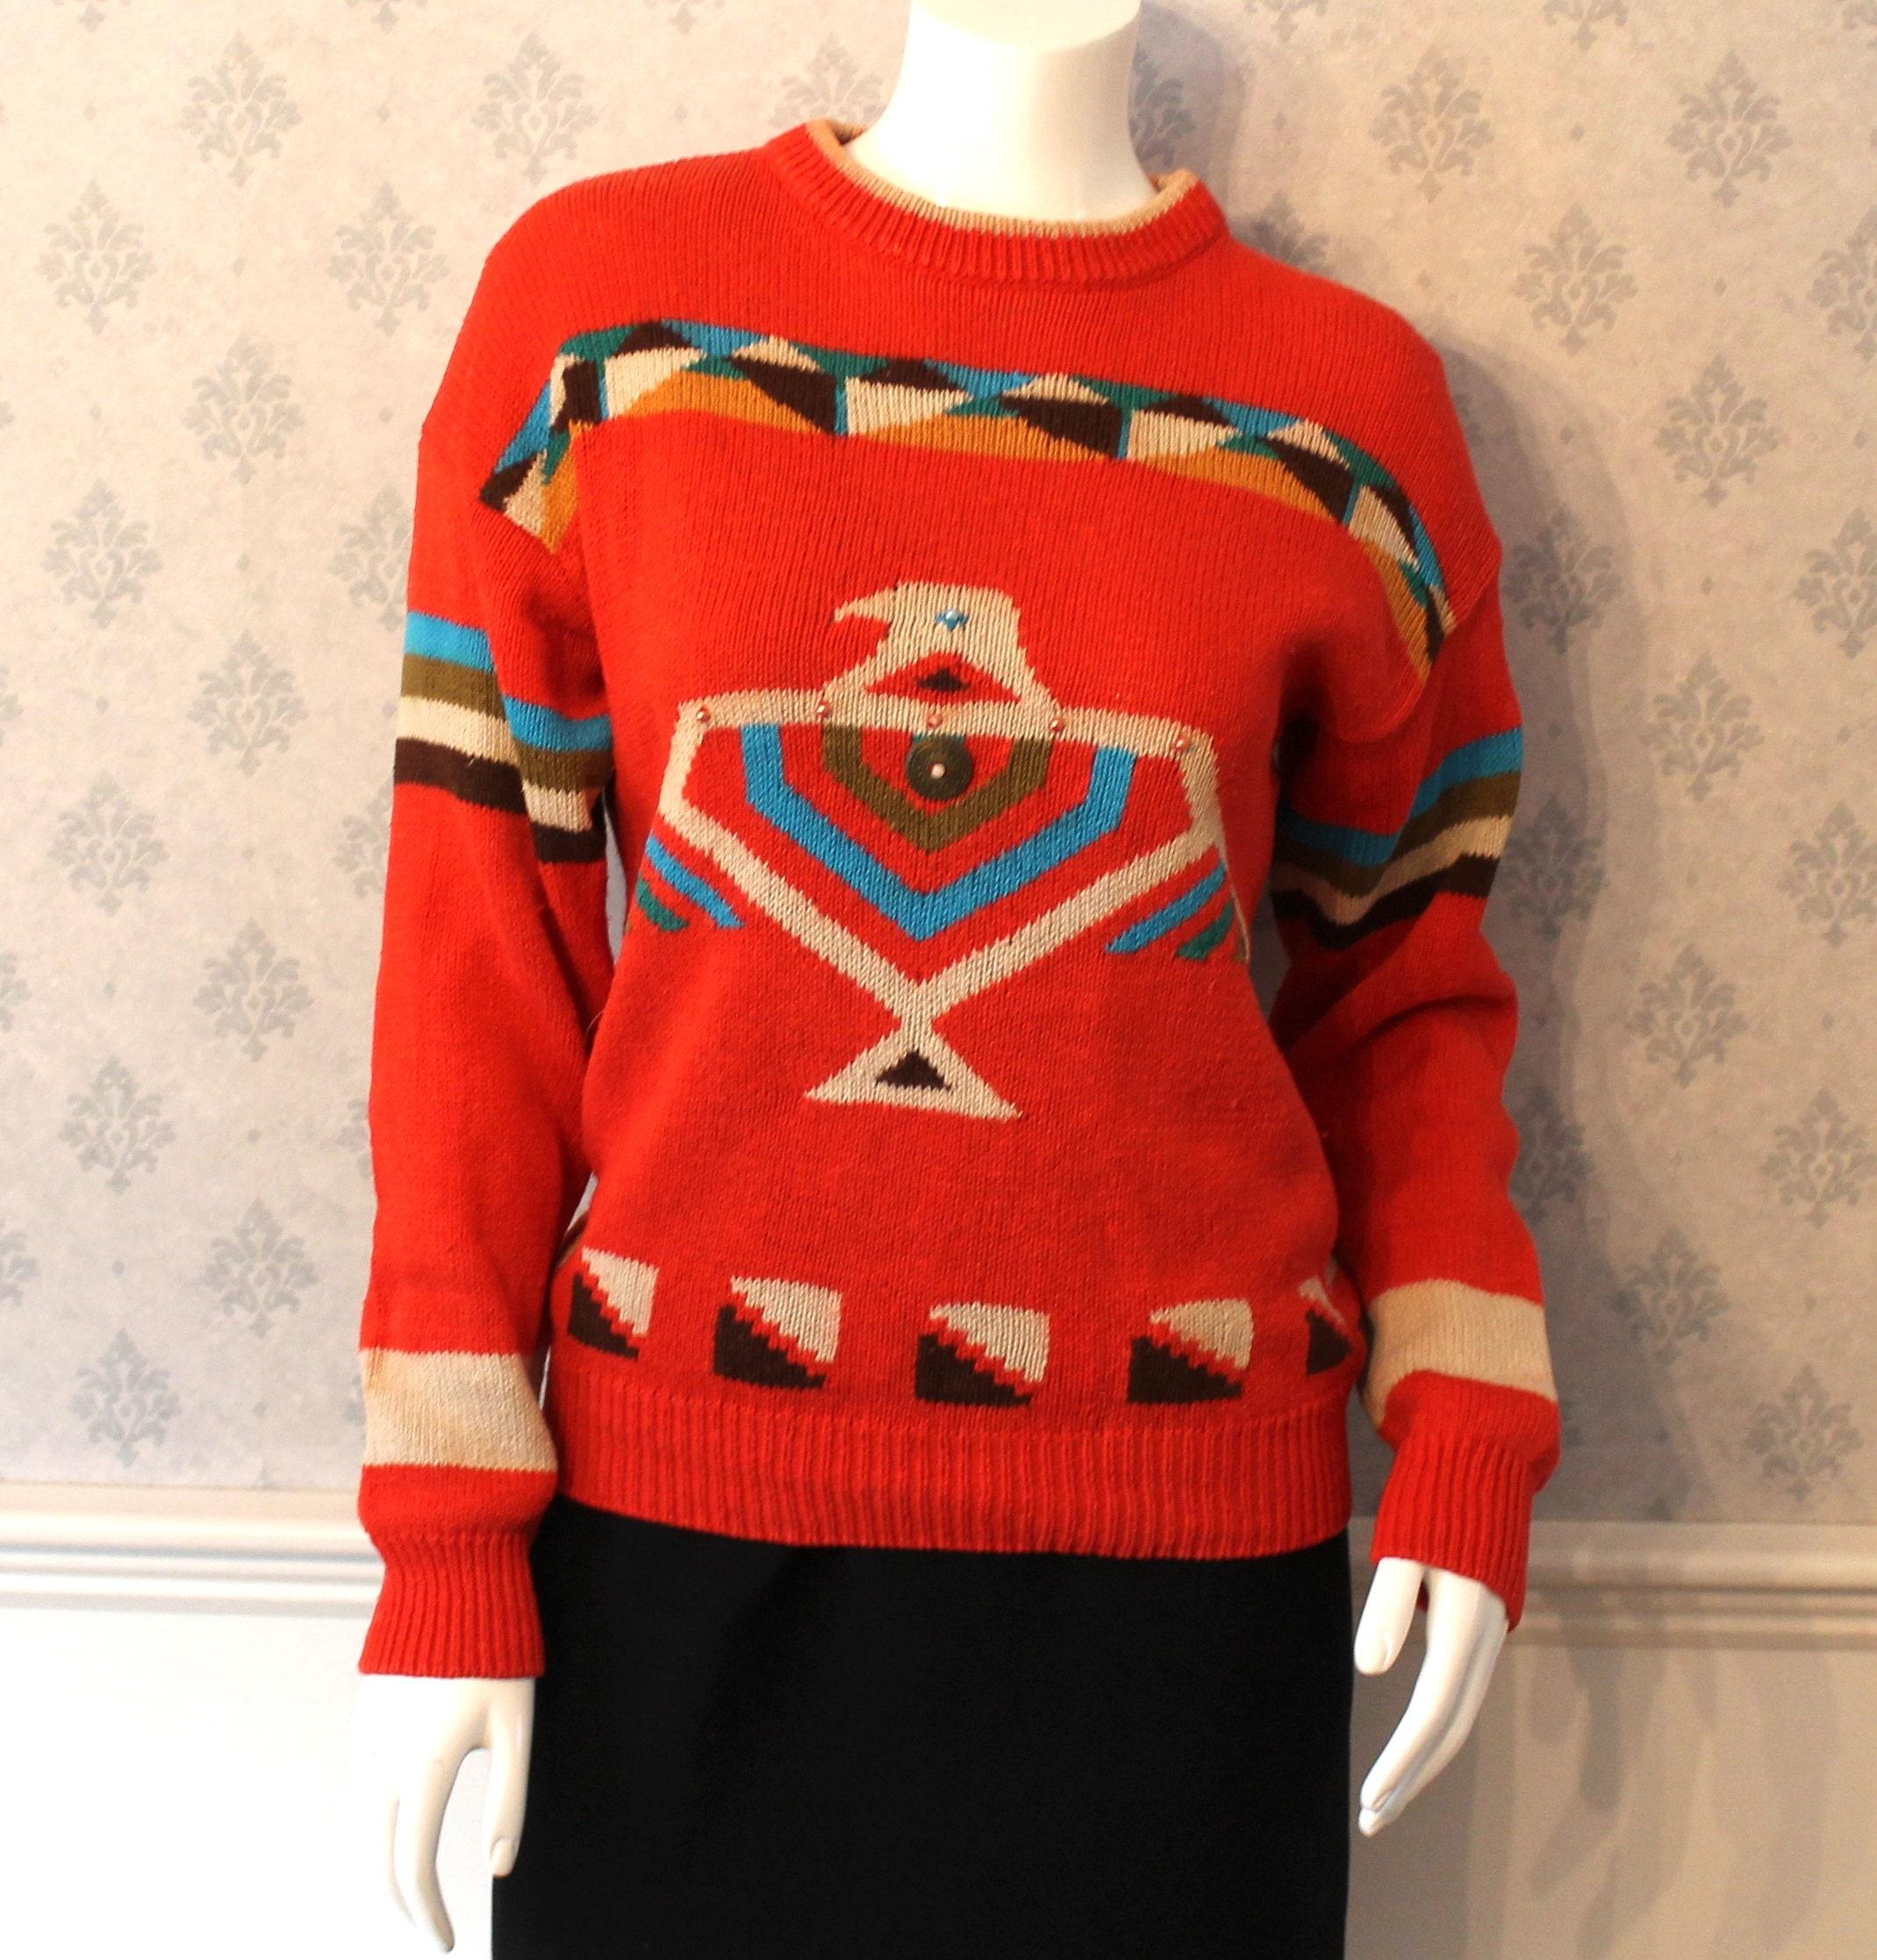 80s Sweatshirts, Sweaters, Vests | Women Vintage 1980S Evian Colorful Orange Aztec Long Sleeve Sweater $25.00 AT vintagedancer.com